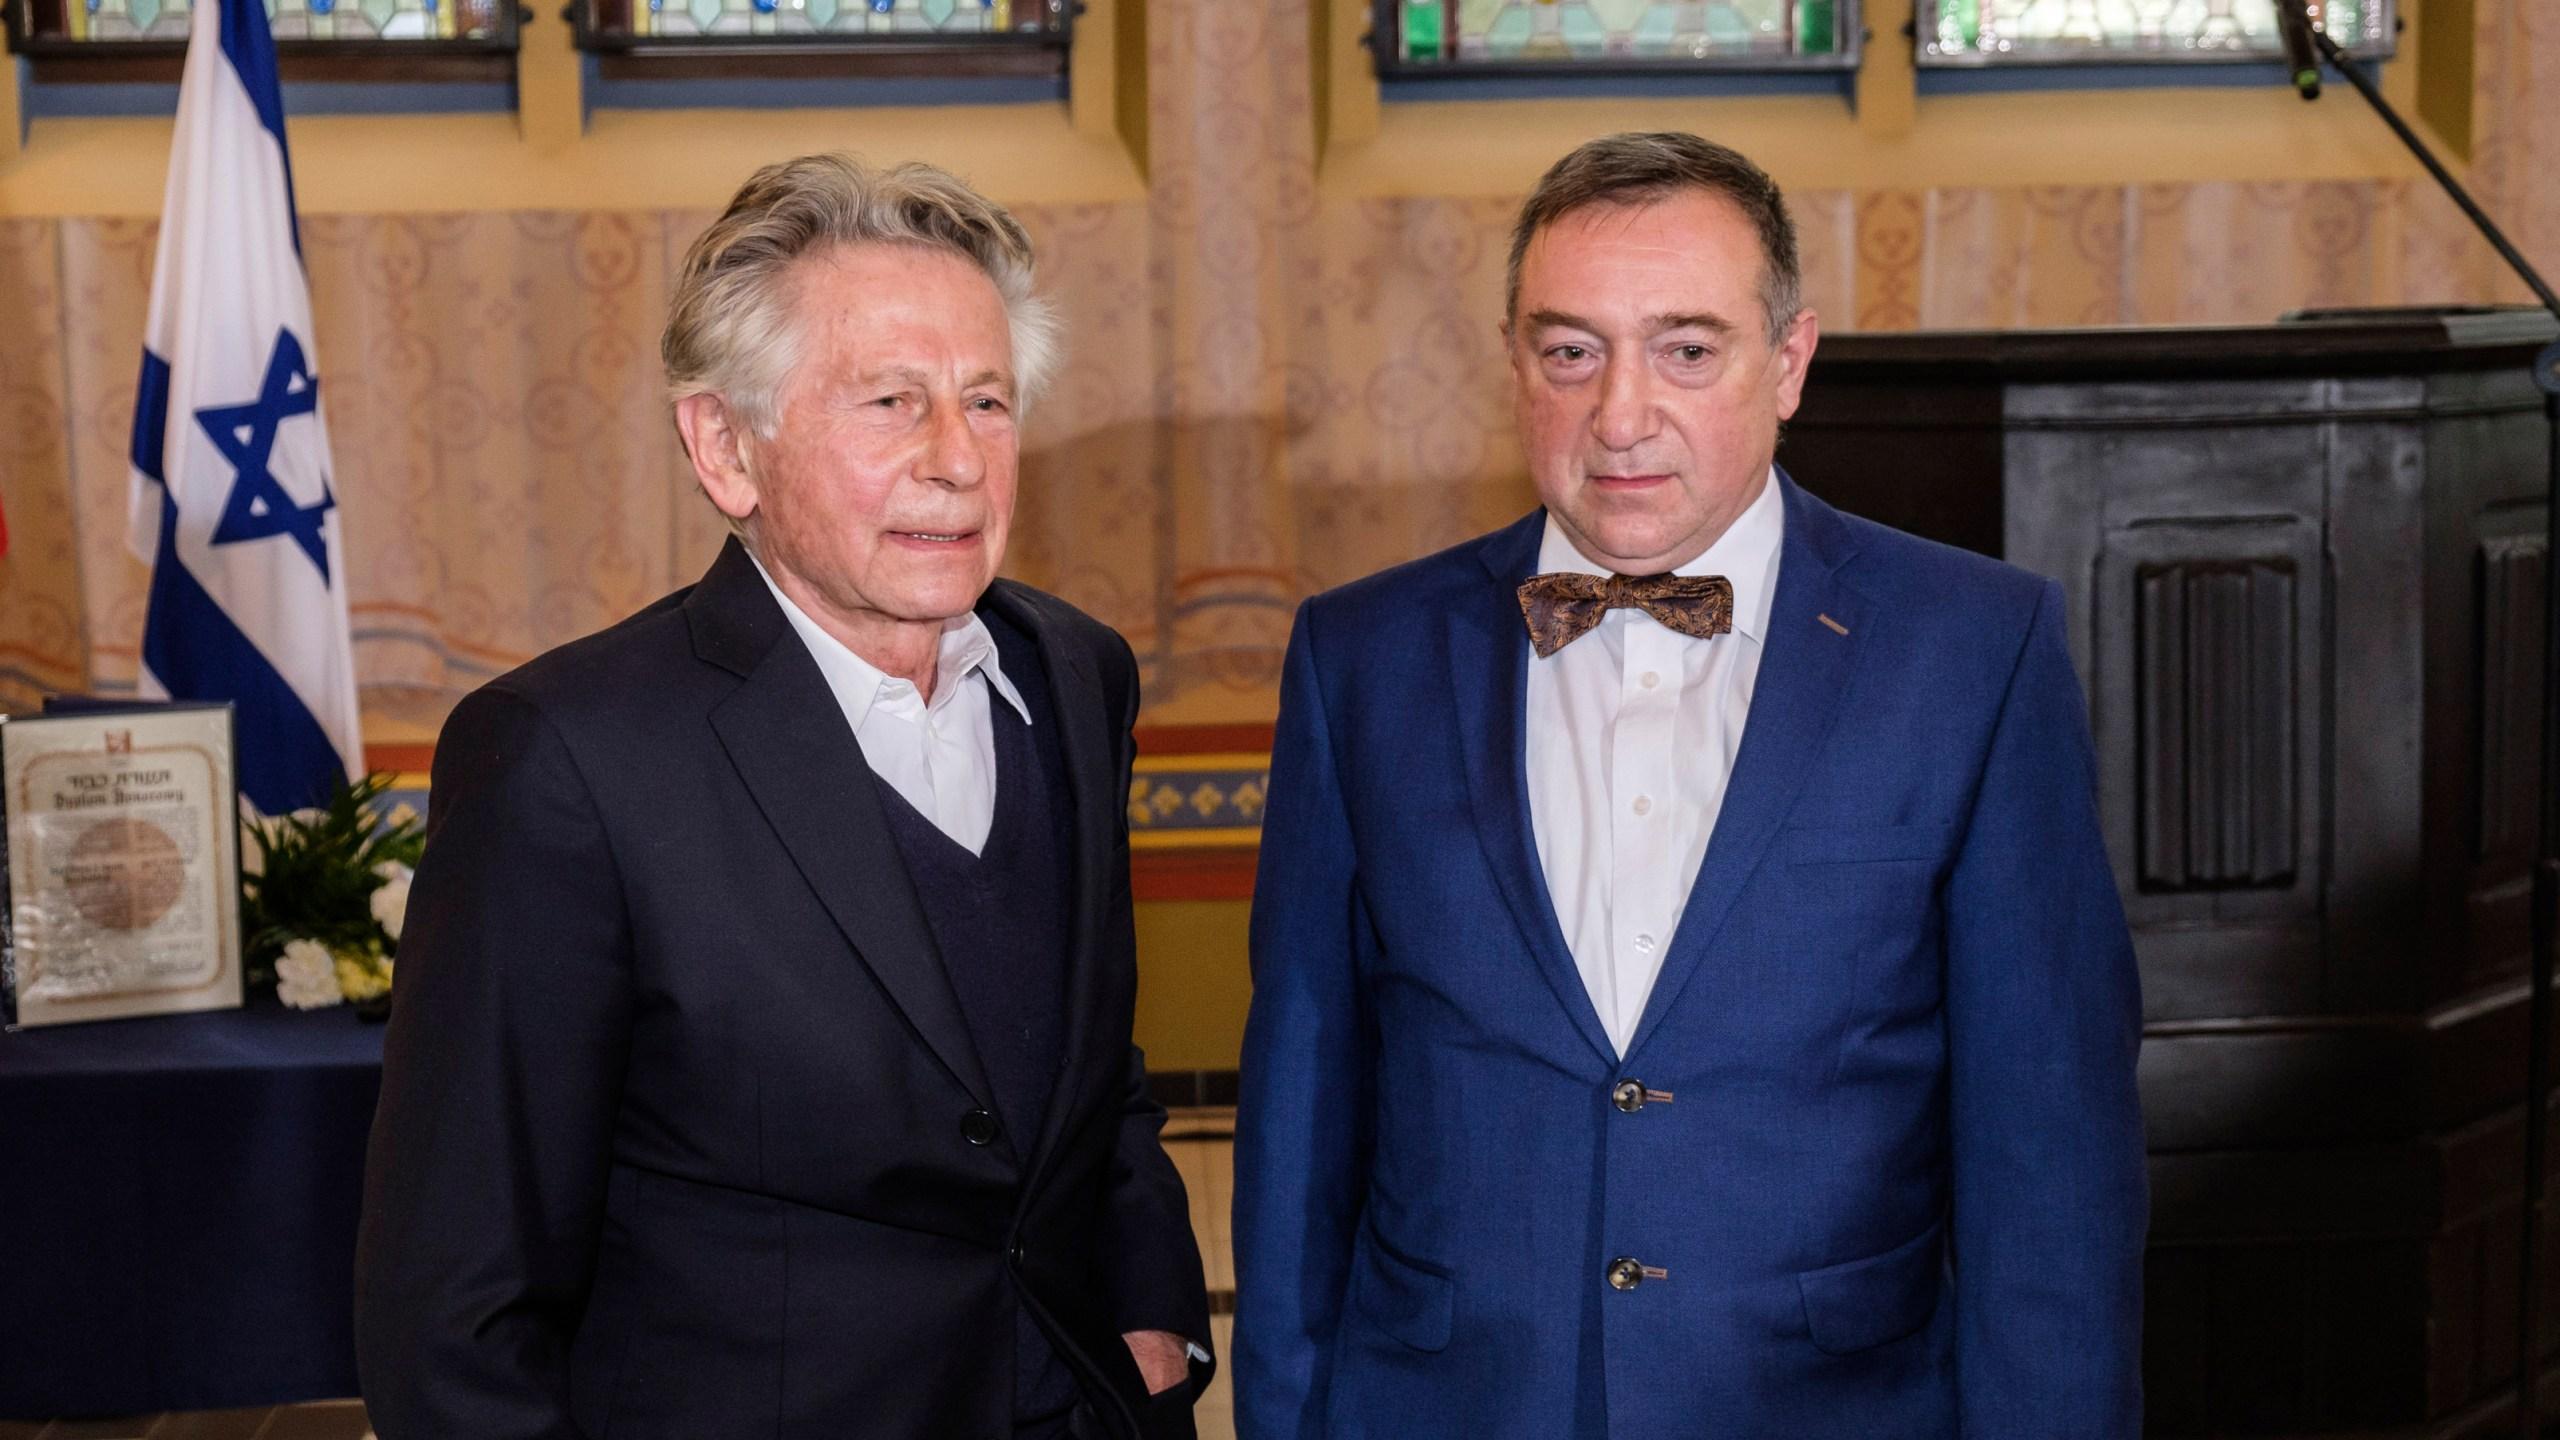 Roman Polanski, Stanislaw Buchala